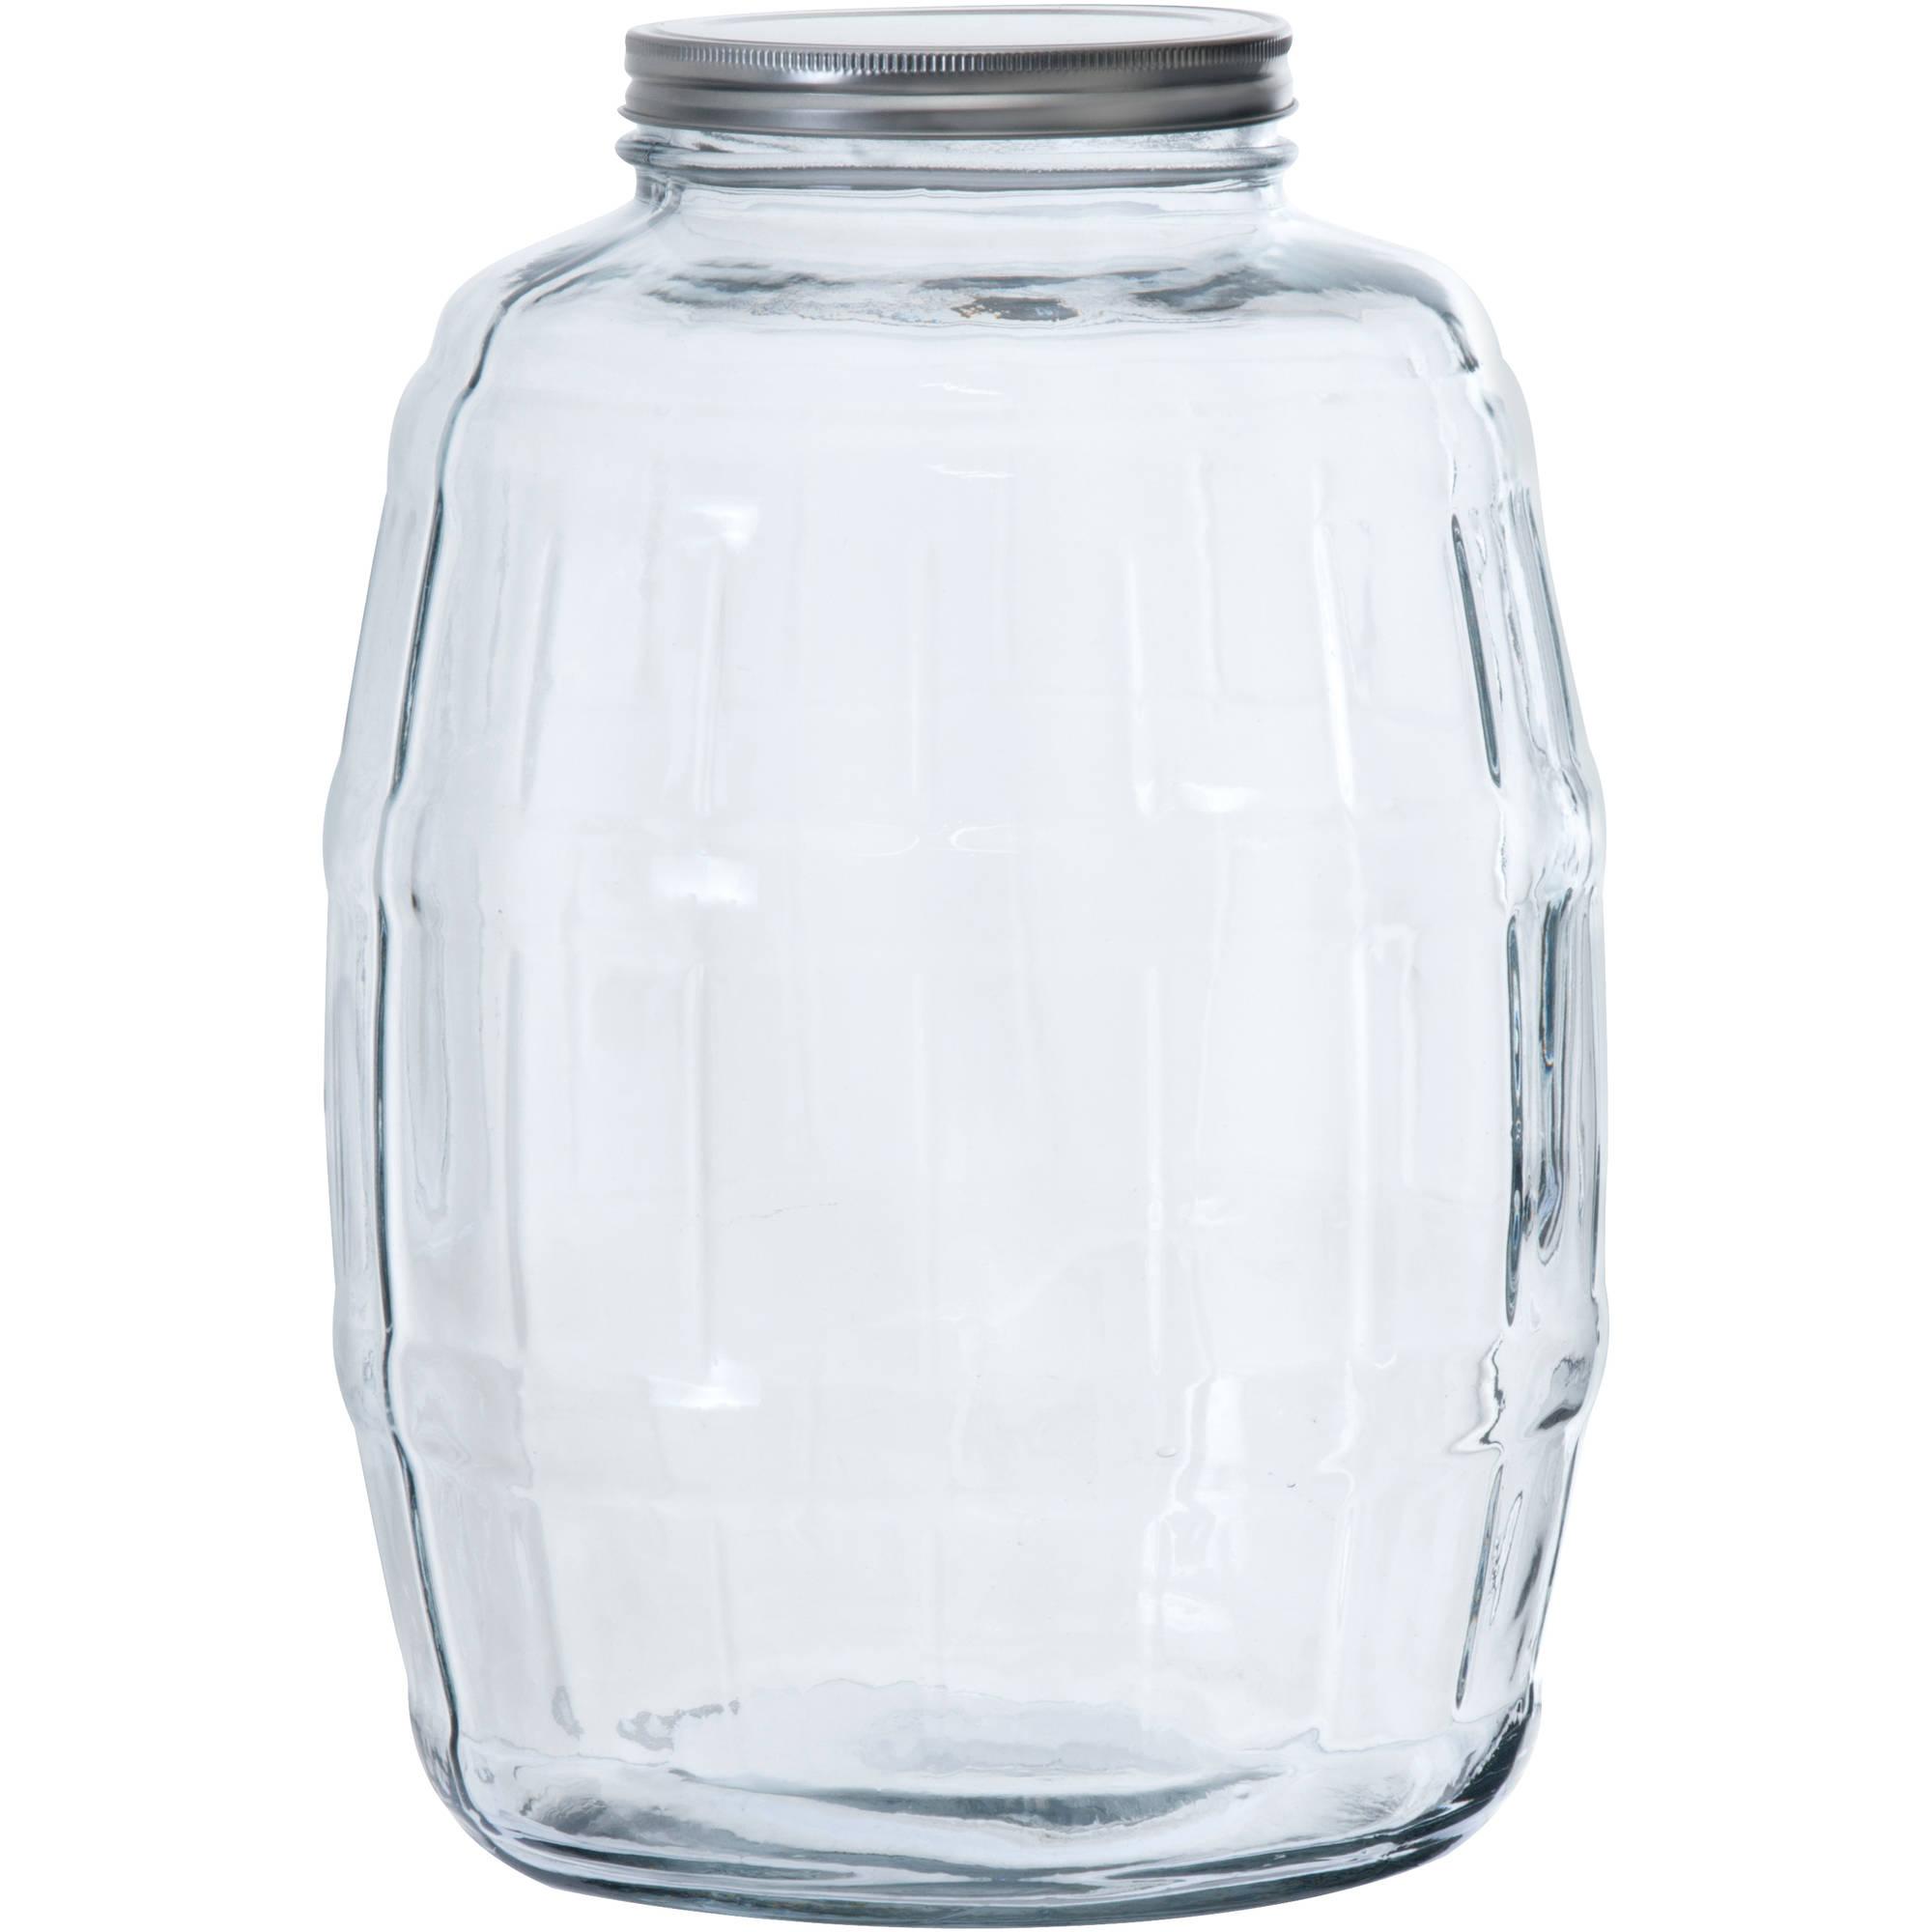 Anchor Hocking 2 5 Gallon Glass Barrel Jar Walmart Com